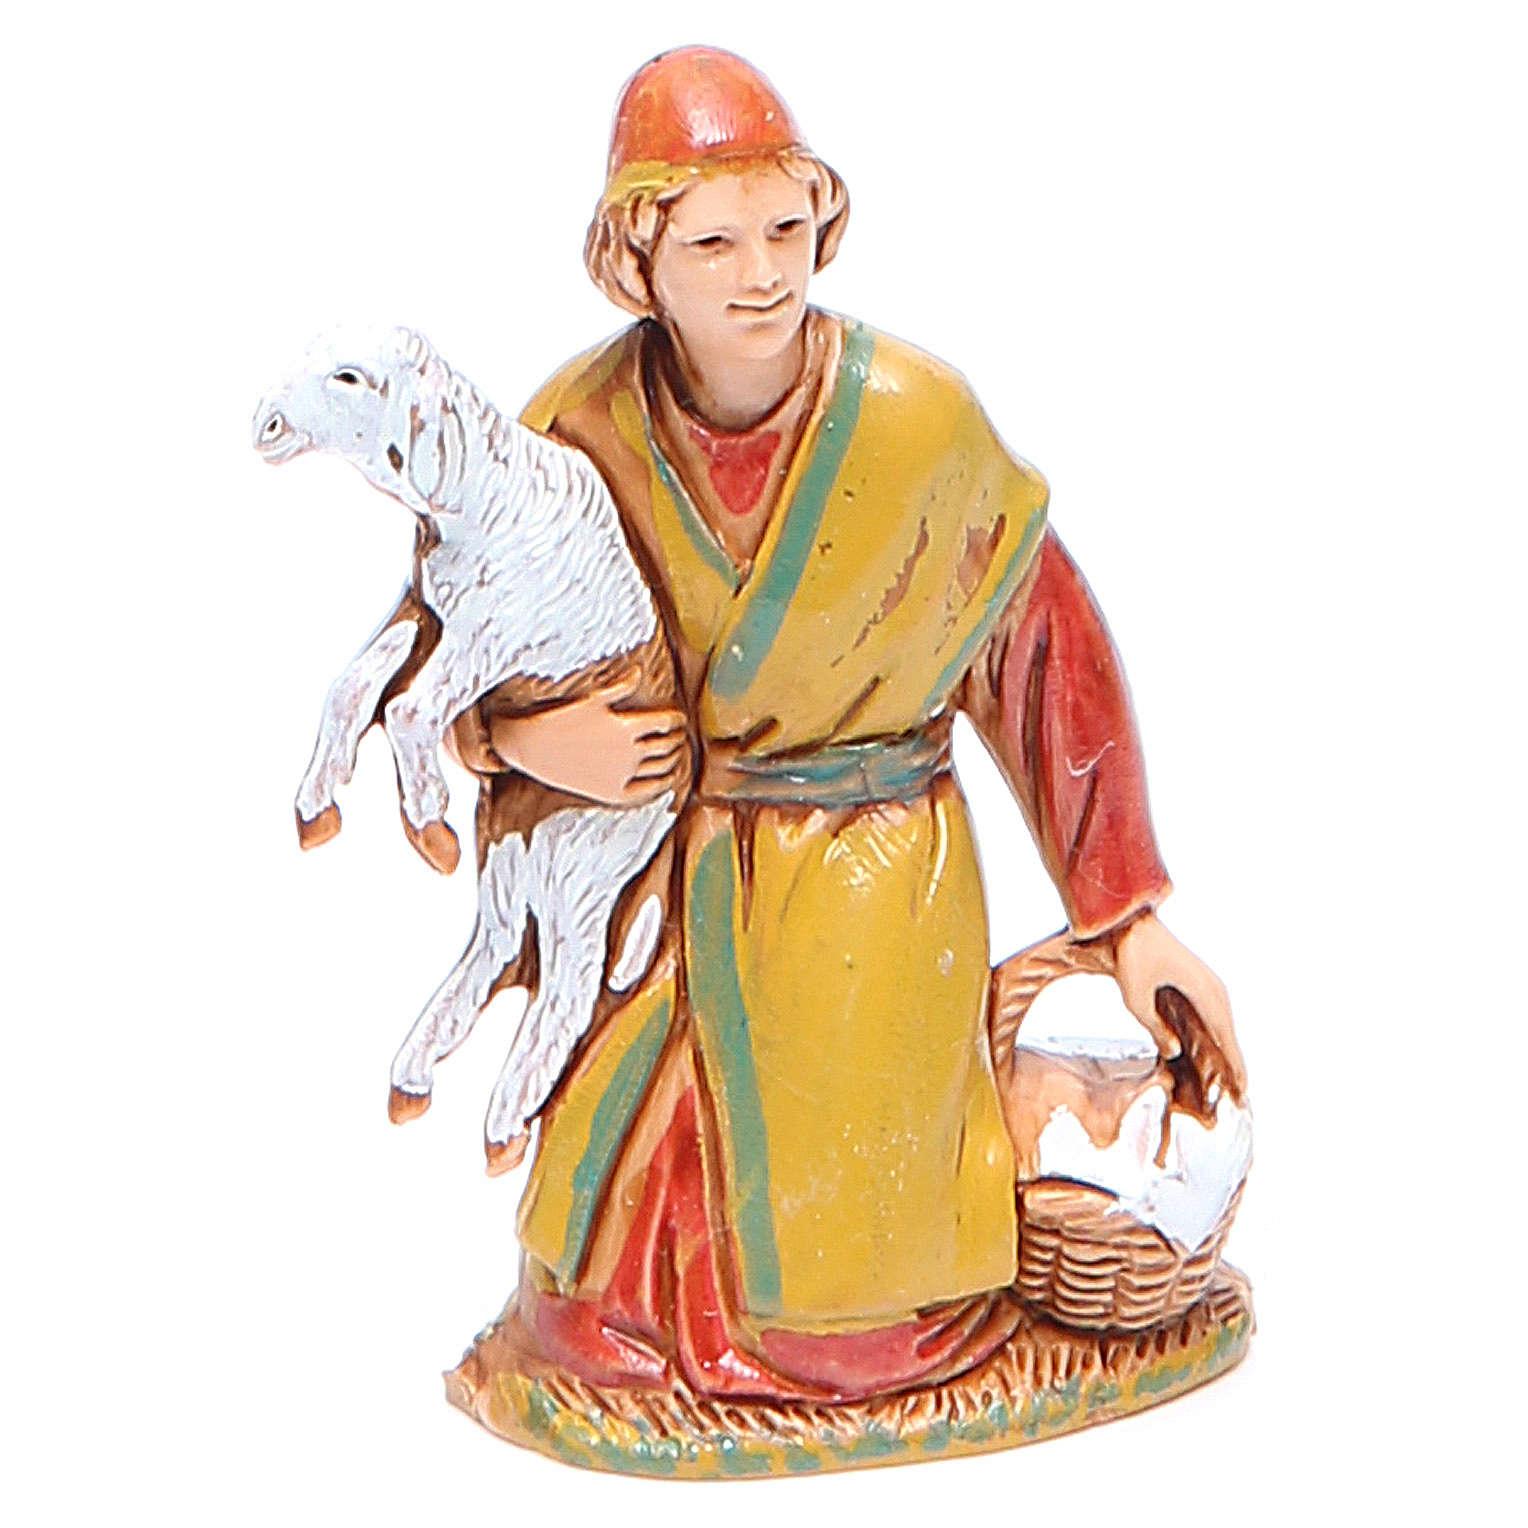 Adorante 6,5 cm Moranduzzo costumi storici 4